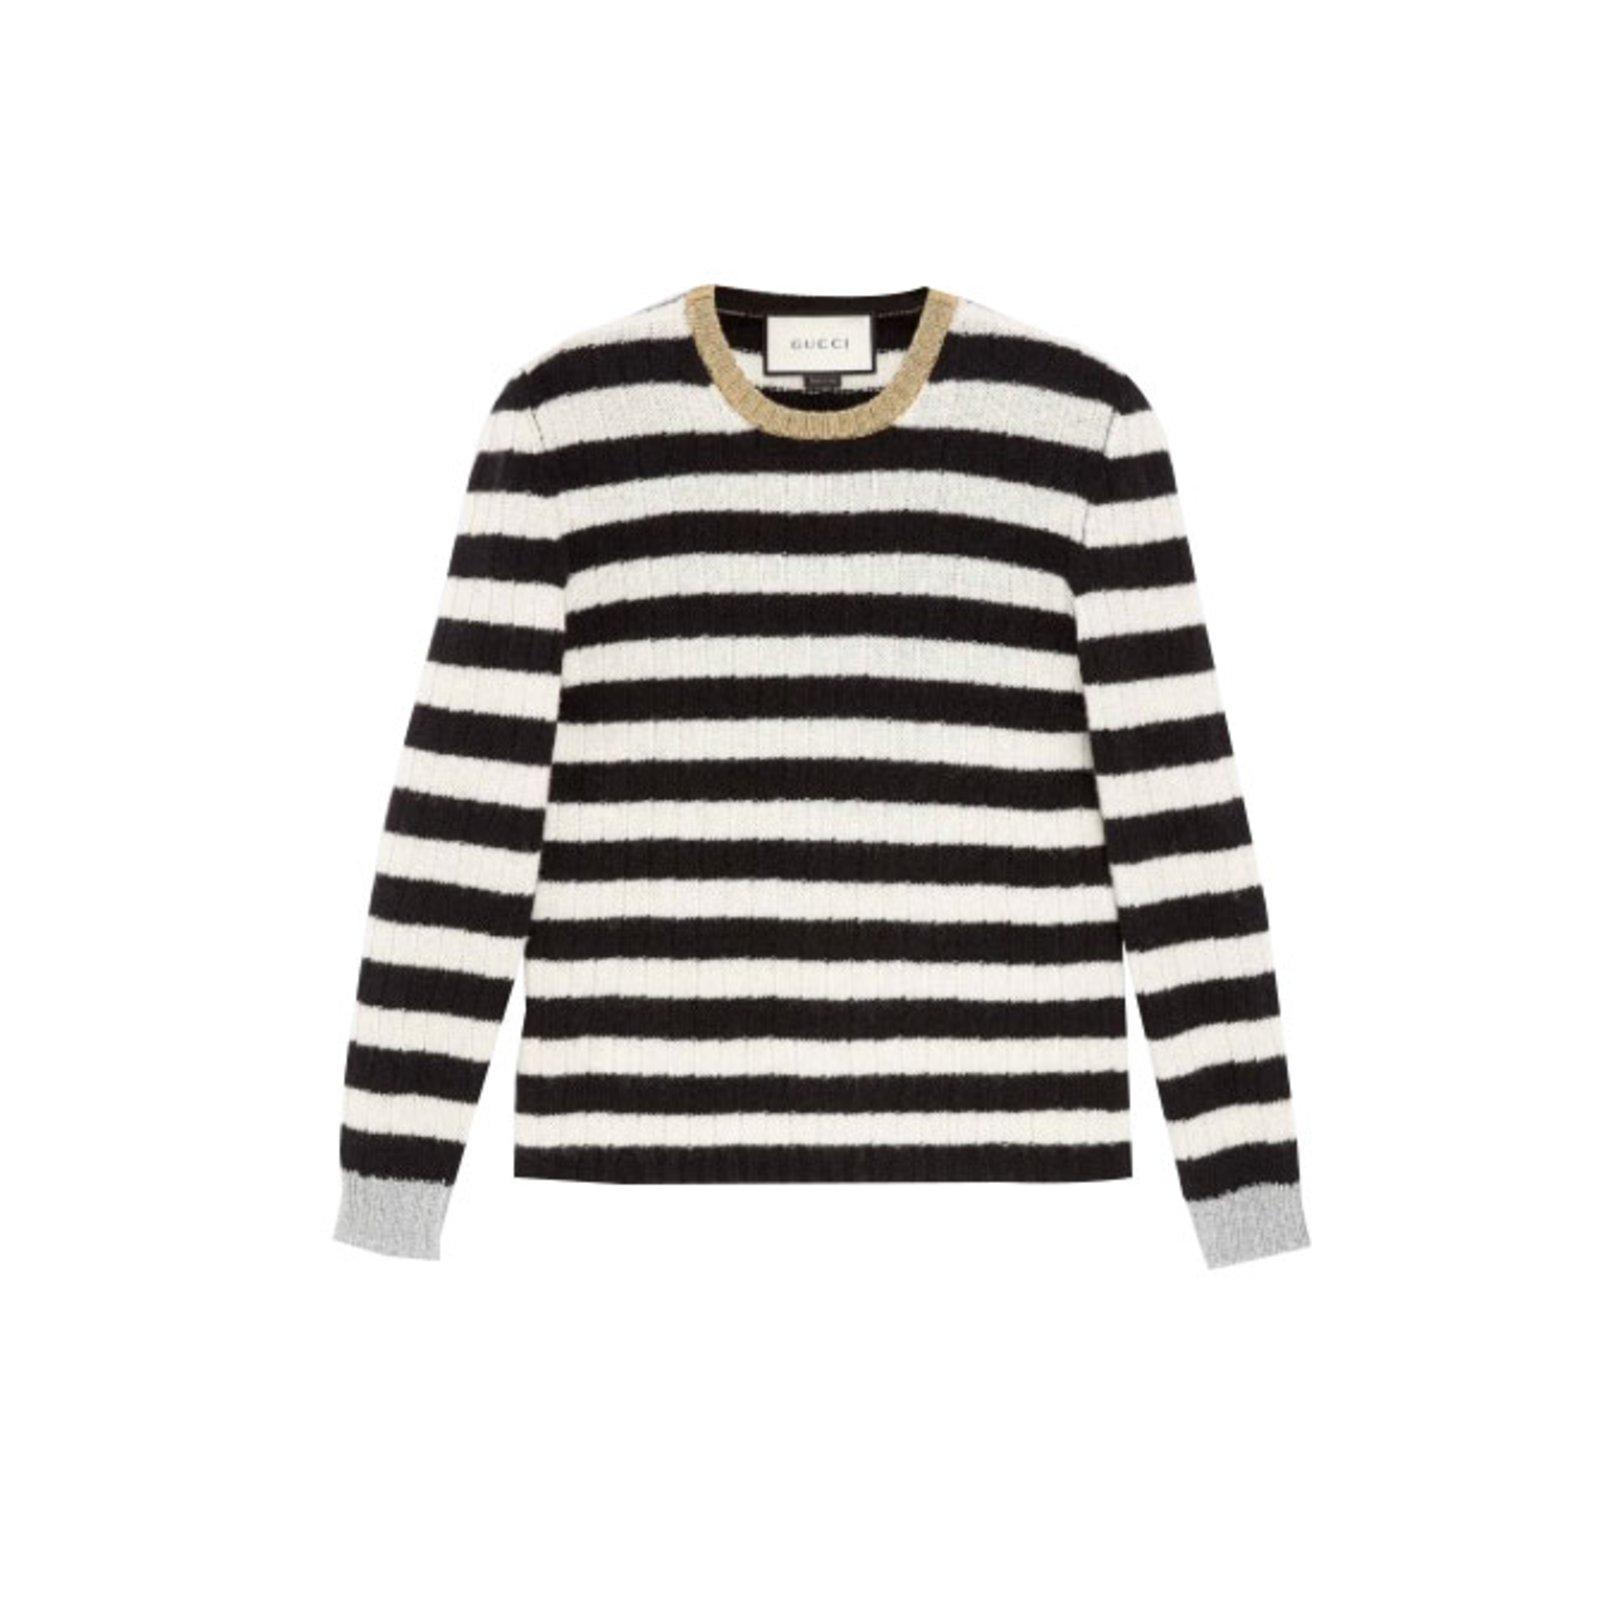 gucci sweater. gucci sweater knitwear cashmere black ref.50280